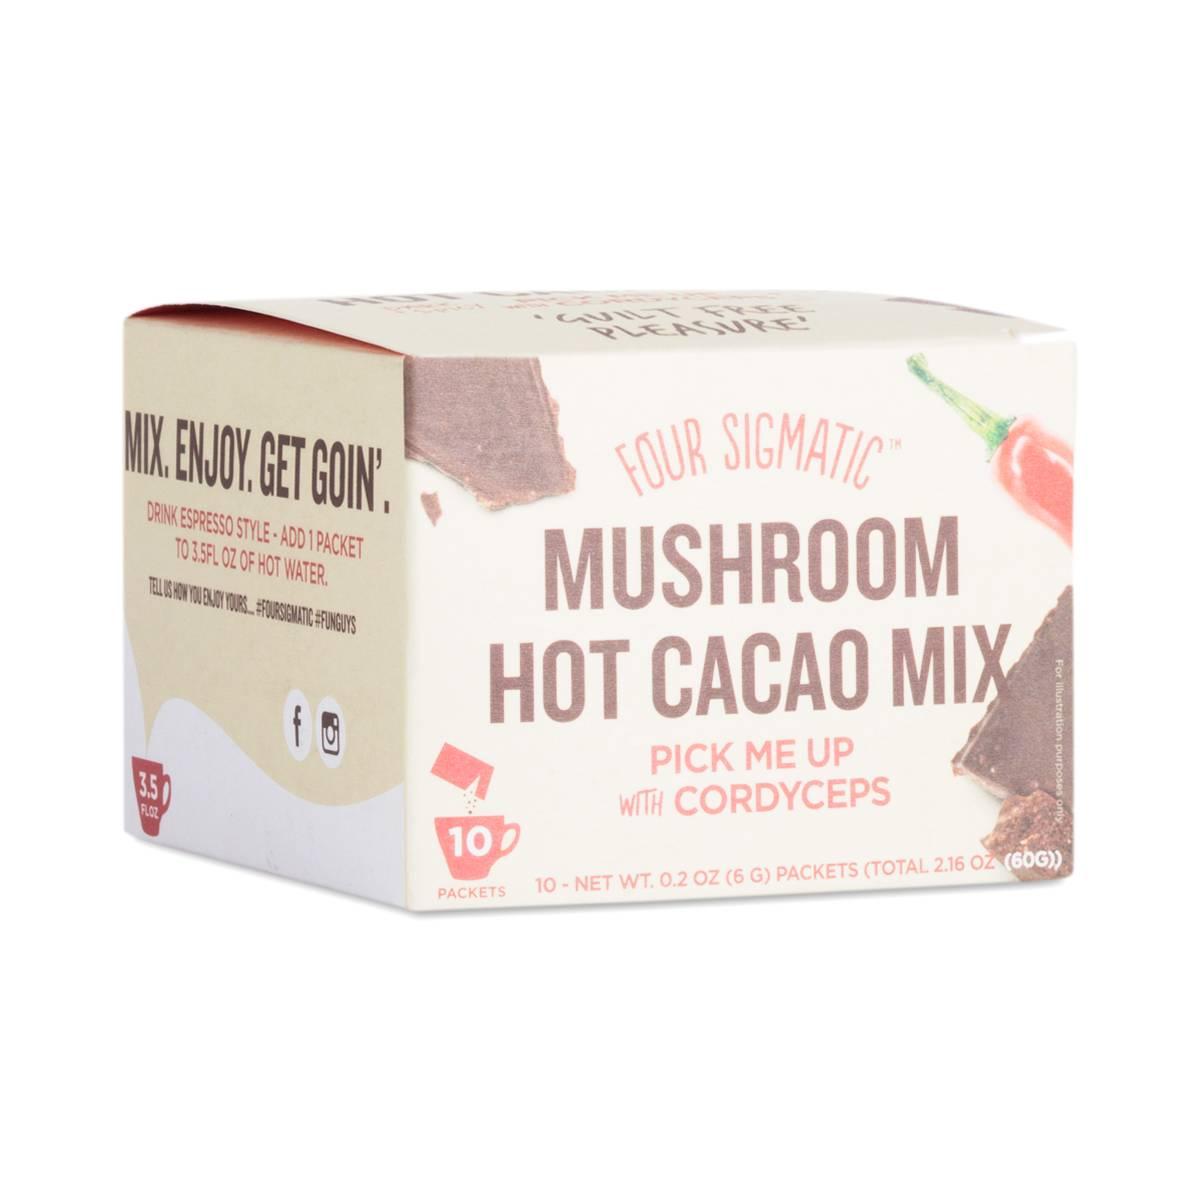 Sigmatic Pasta Maker Spm168 Mushroom Hot Cacao Mix W Guarana Chili Amp Rose Hip Coffee Scfm500 Dinomarket Belanja